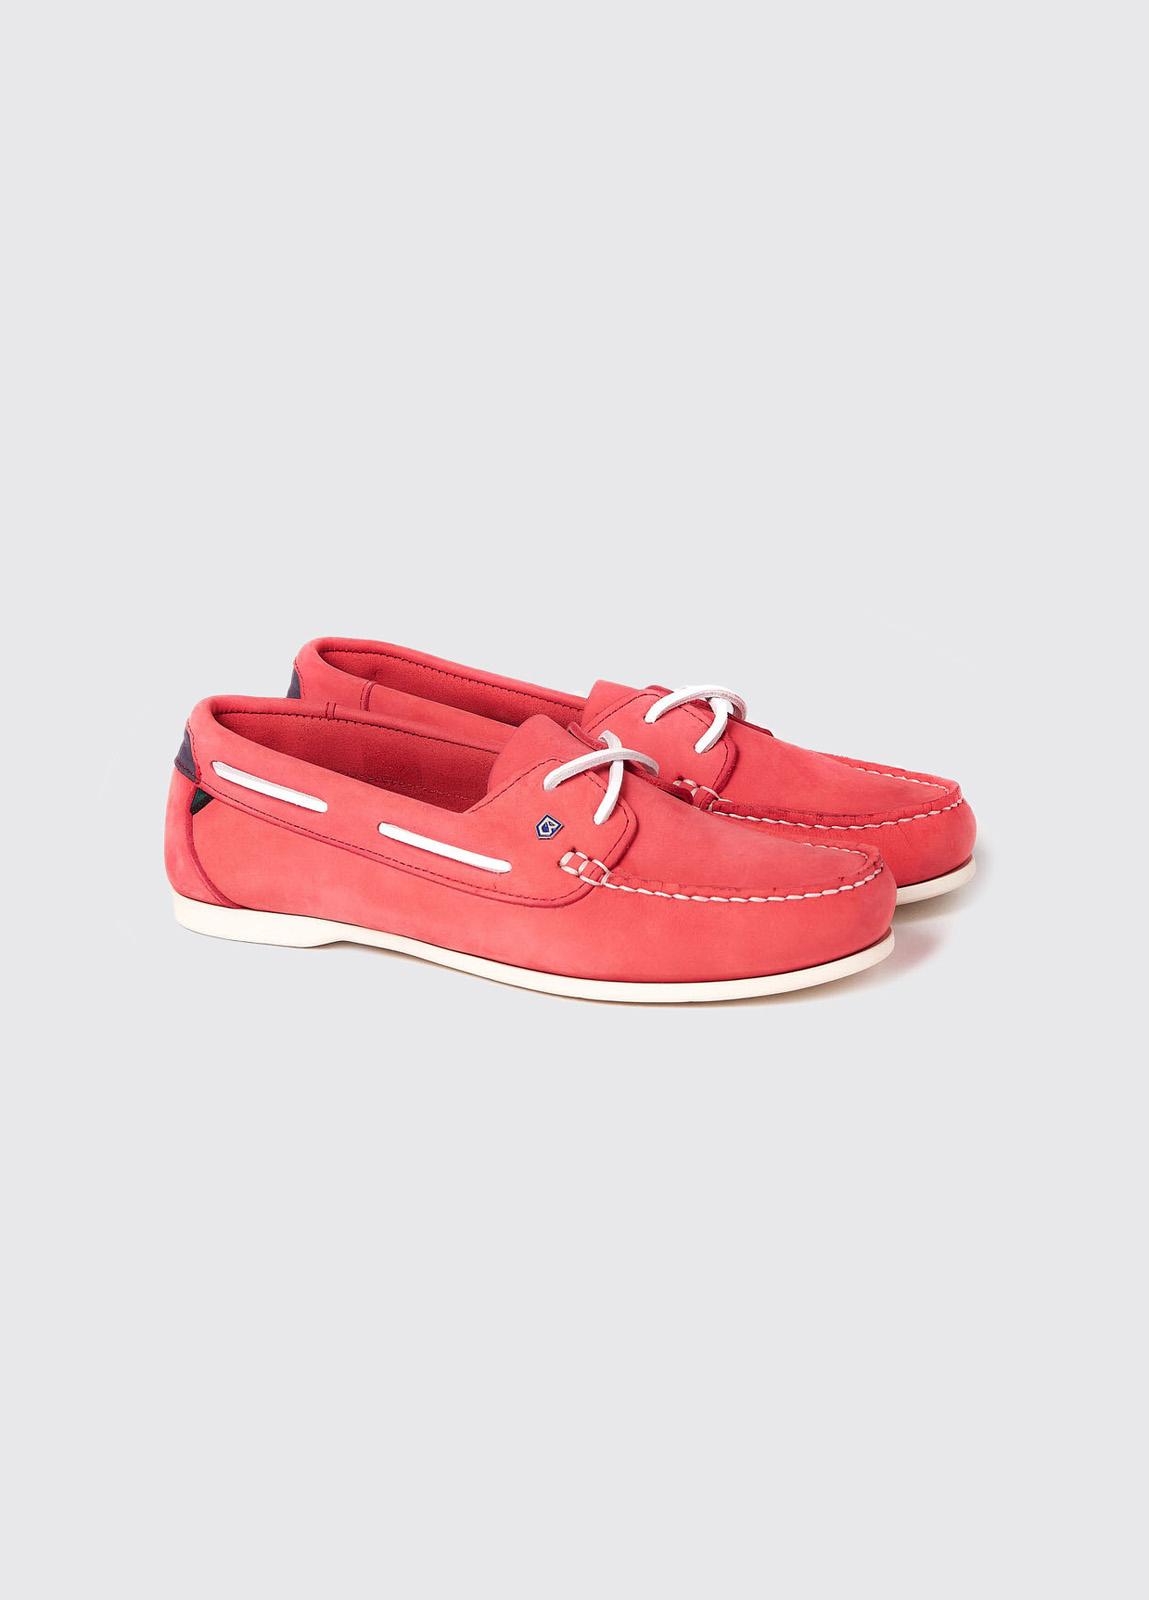 Aruba Deck Shoe - Coral